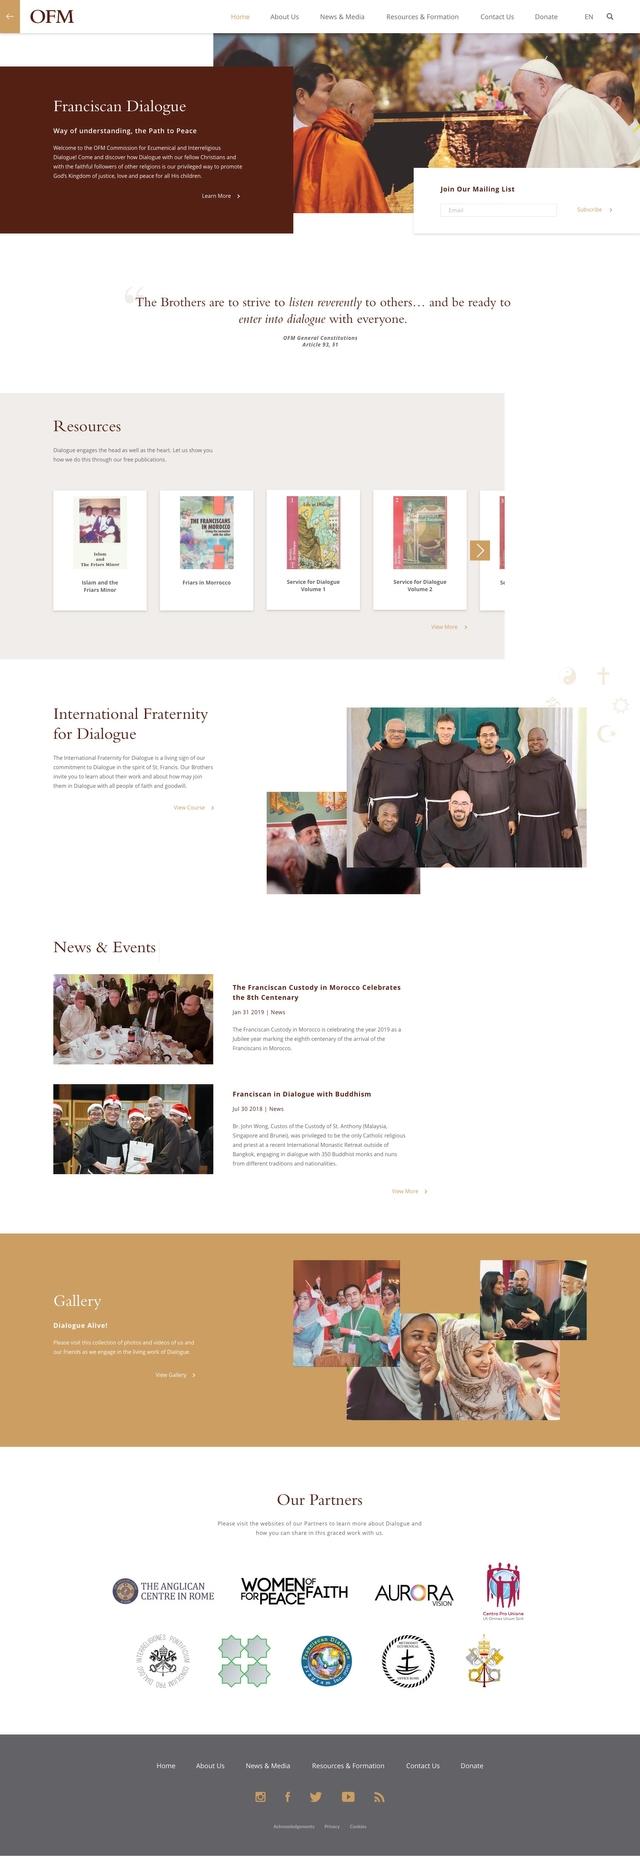 OFM – Interfaith Dialogue